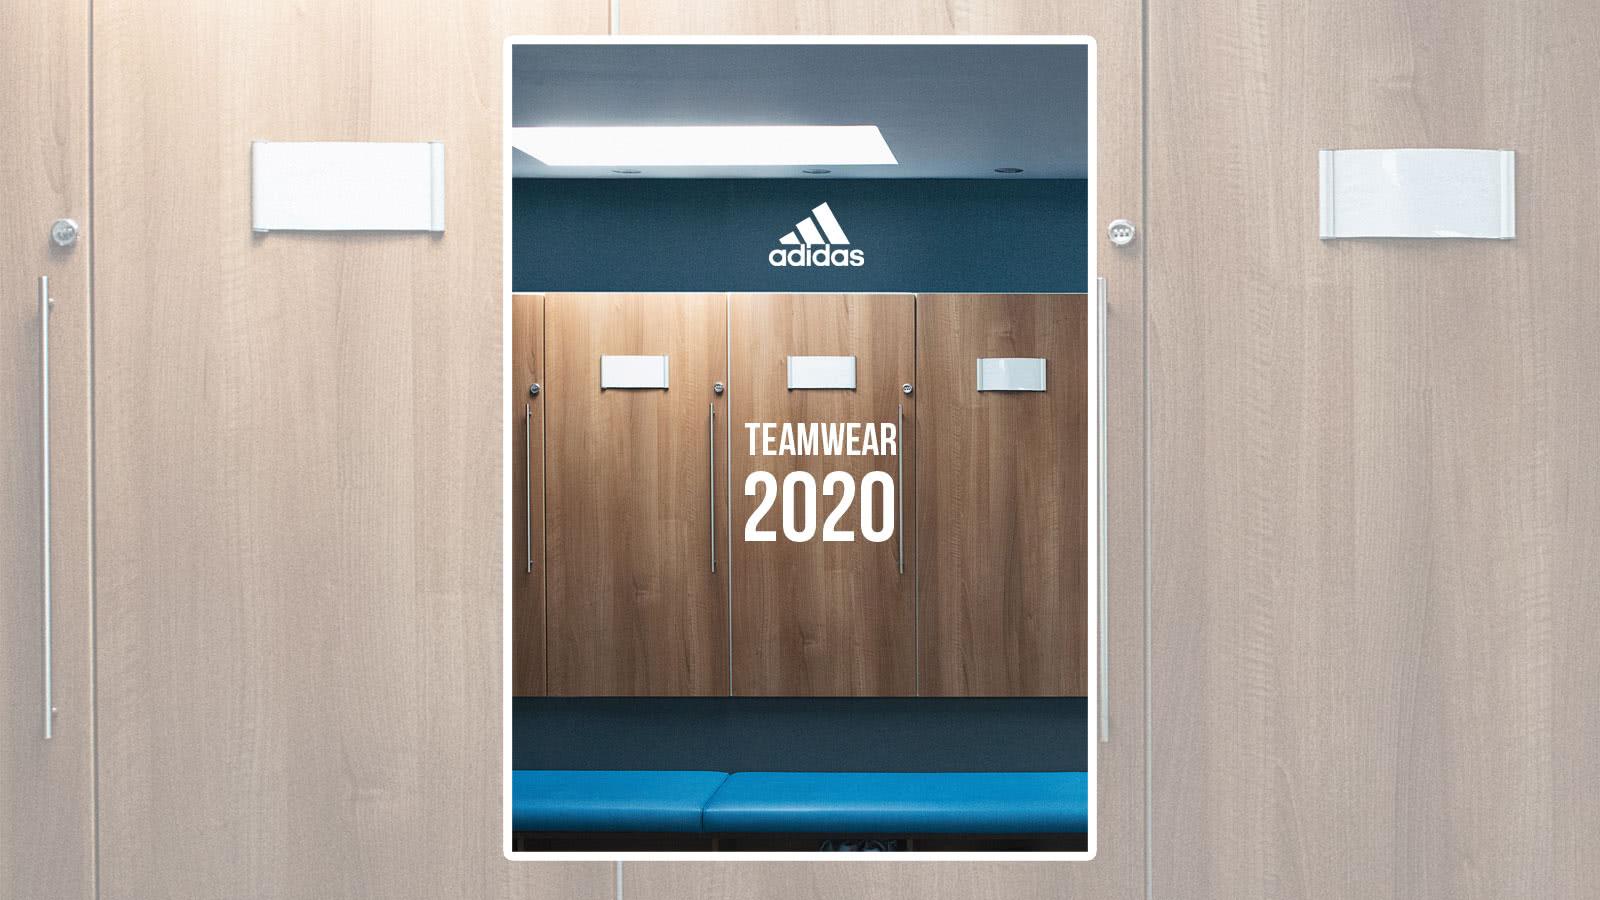 Der adidas Teamsport 2020 Katalog